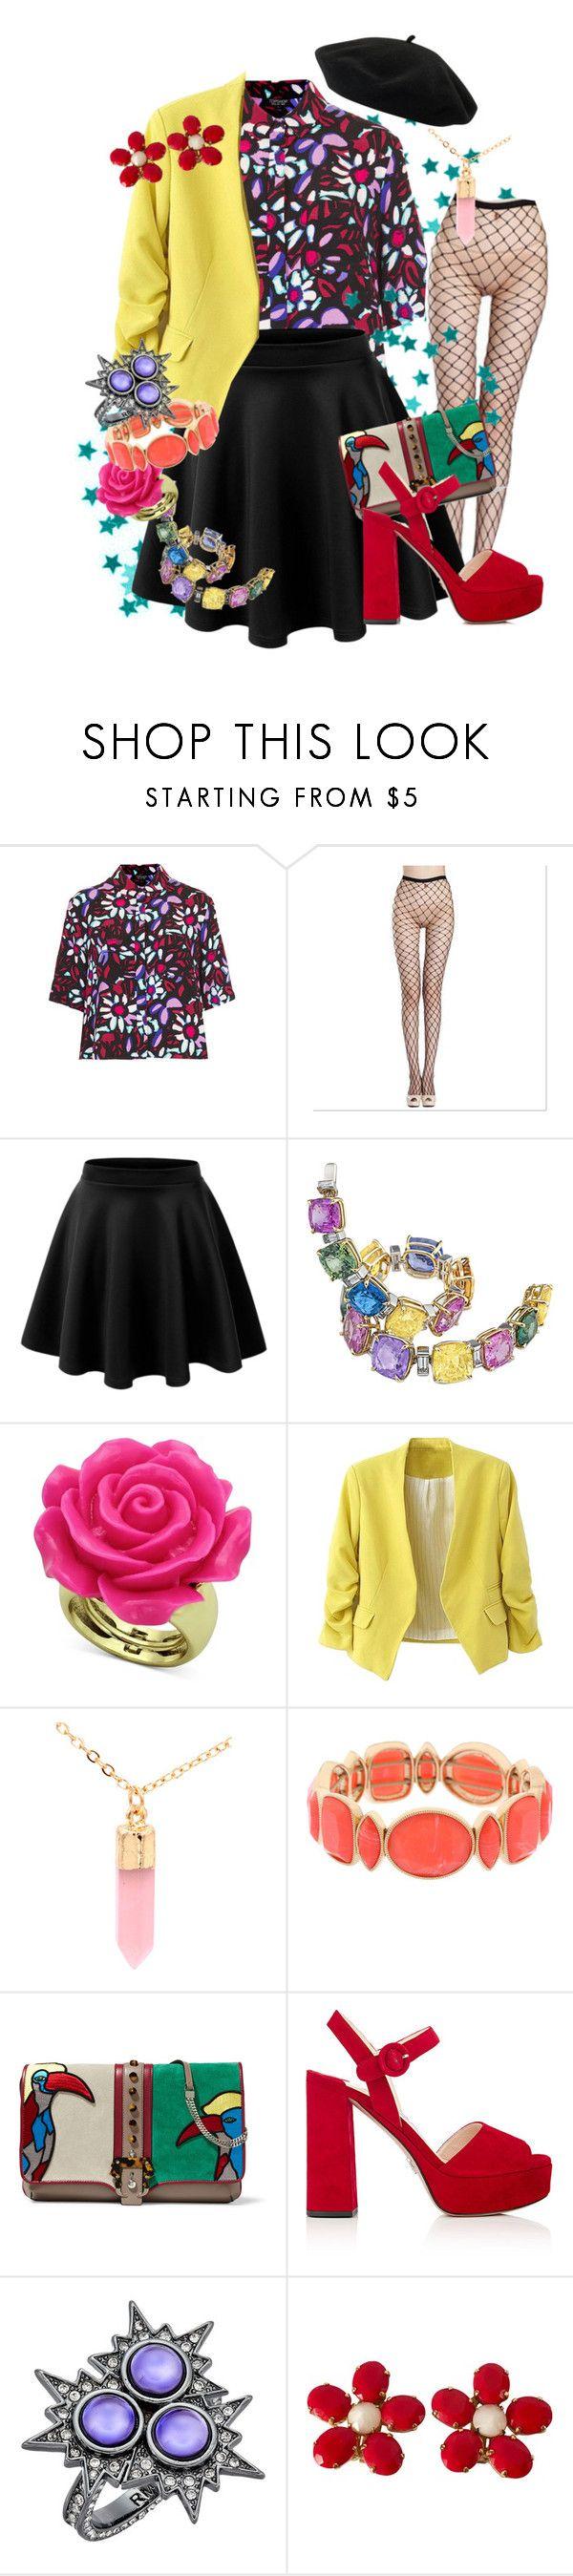 """Yellow Blazer Outfit"" by mongryong ❤ liked on Polyvore featuring Topshop, Silver Rain, Monet, Paula Cademartori, Prada, Rebecca Minkoff, Schreiner and Goorin"